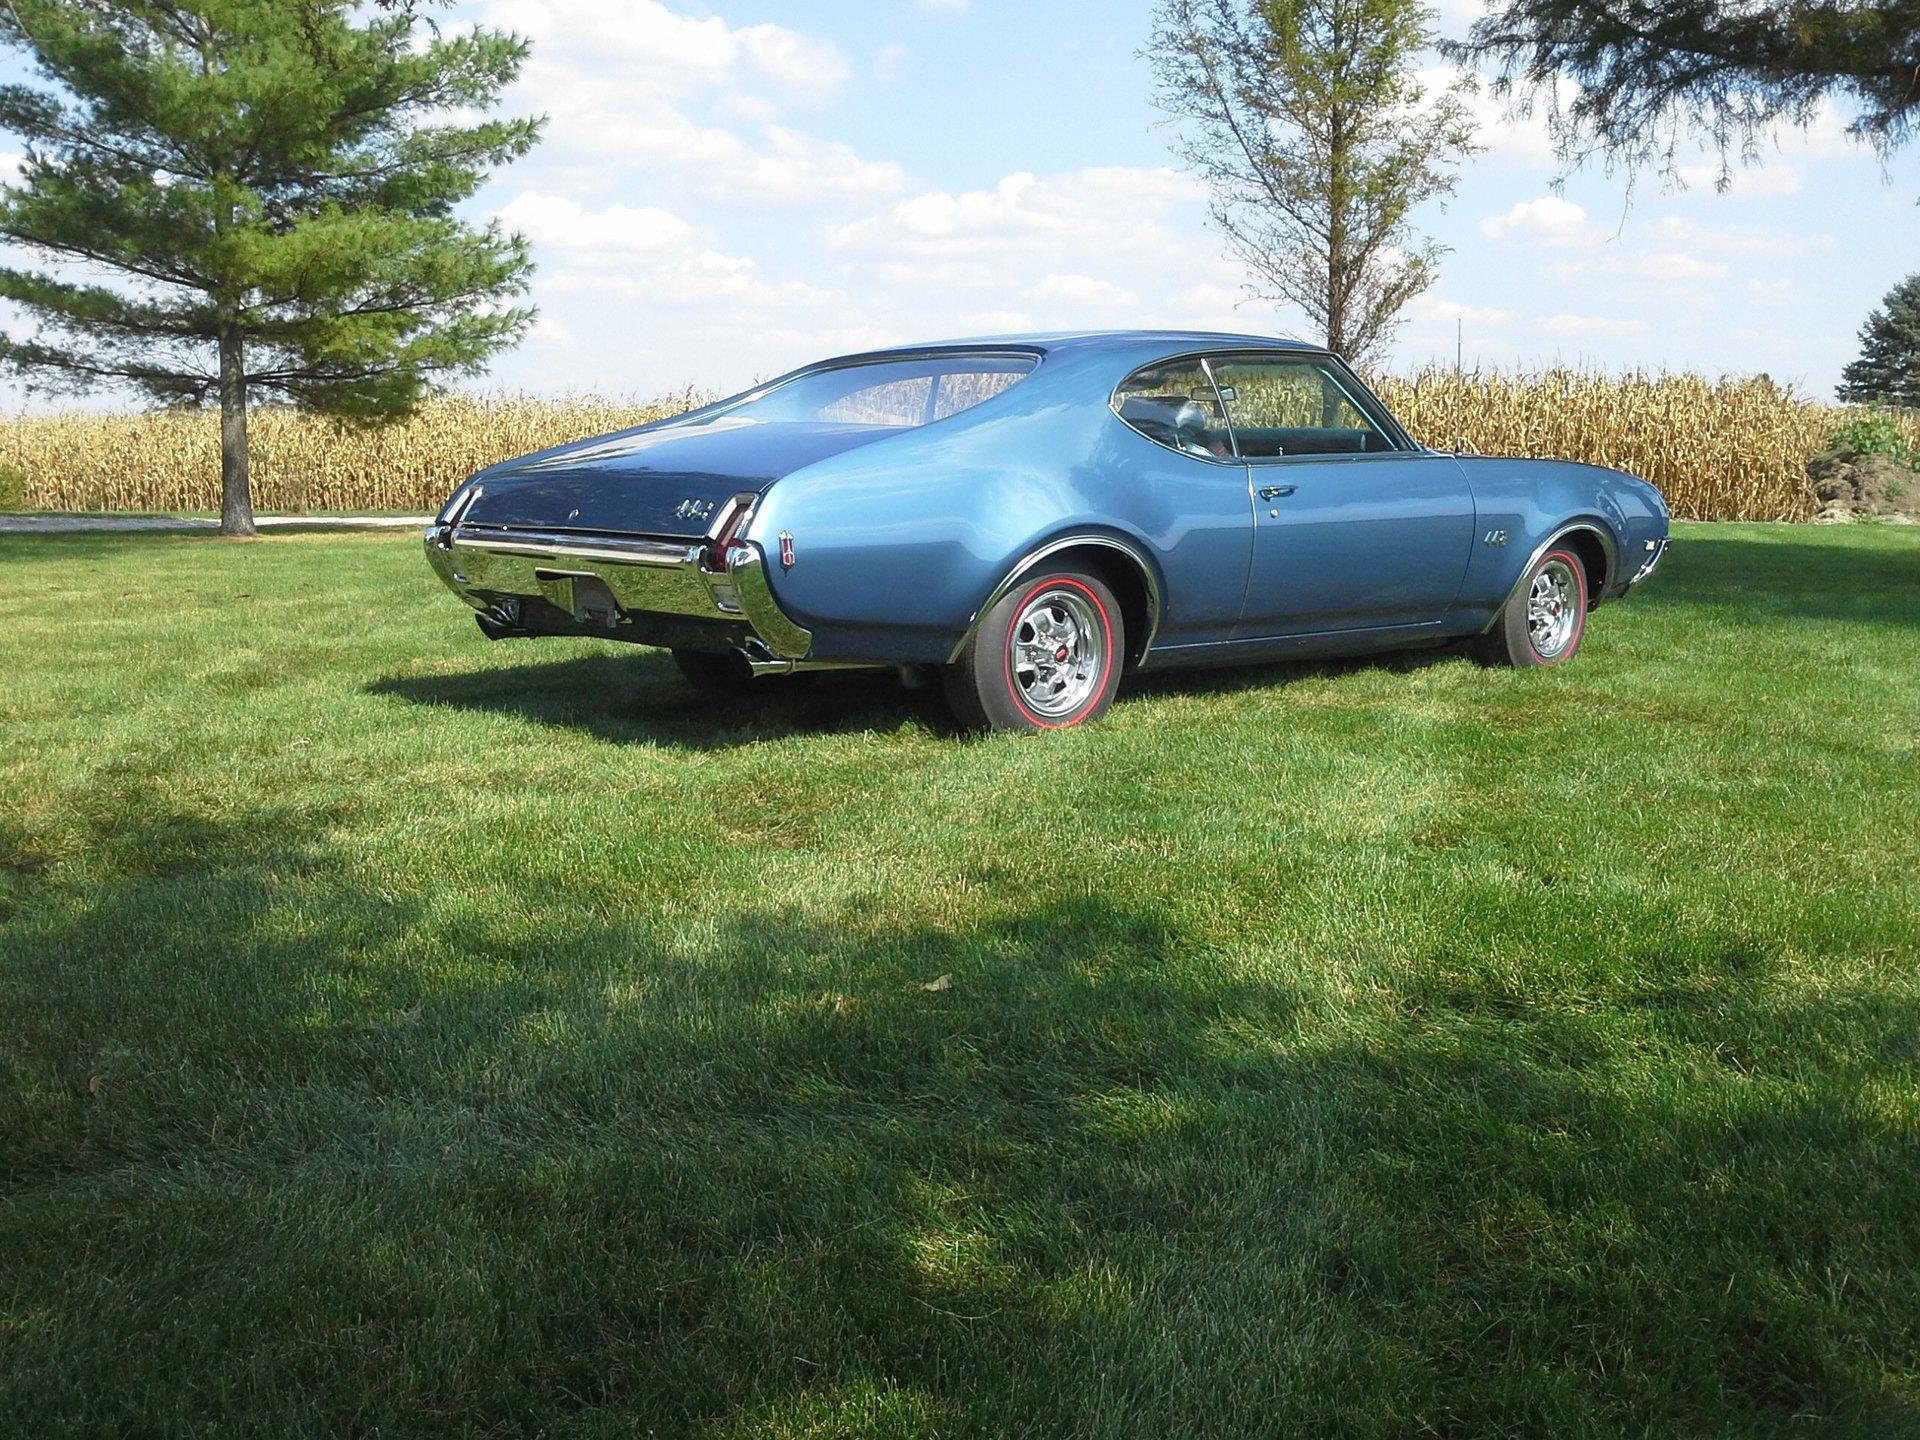 Restored Classic Cars | Auto Restoration | Lovington, IL